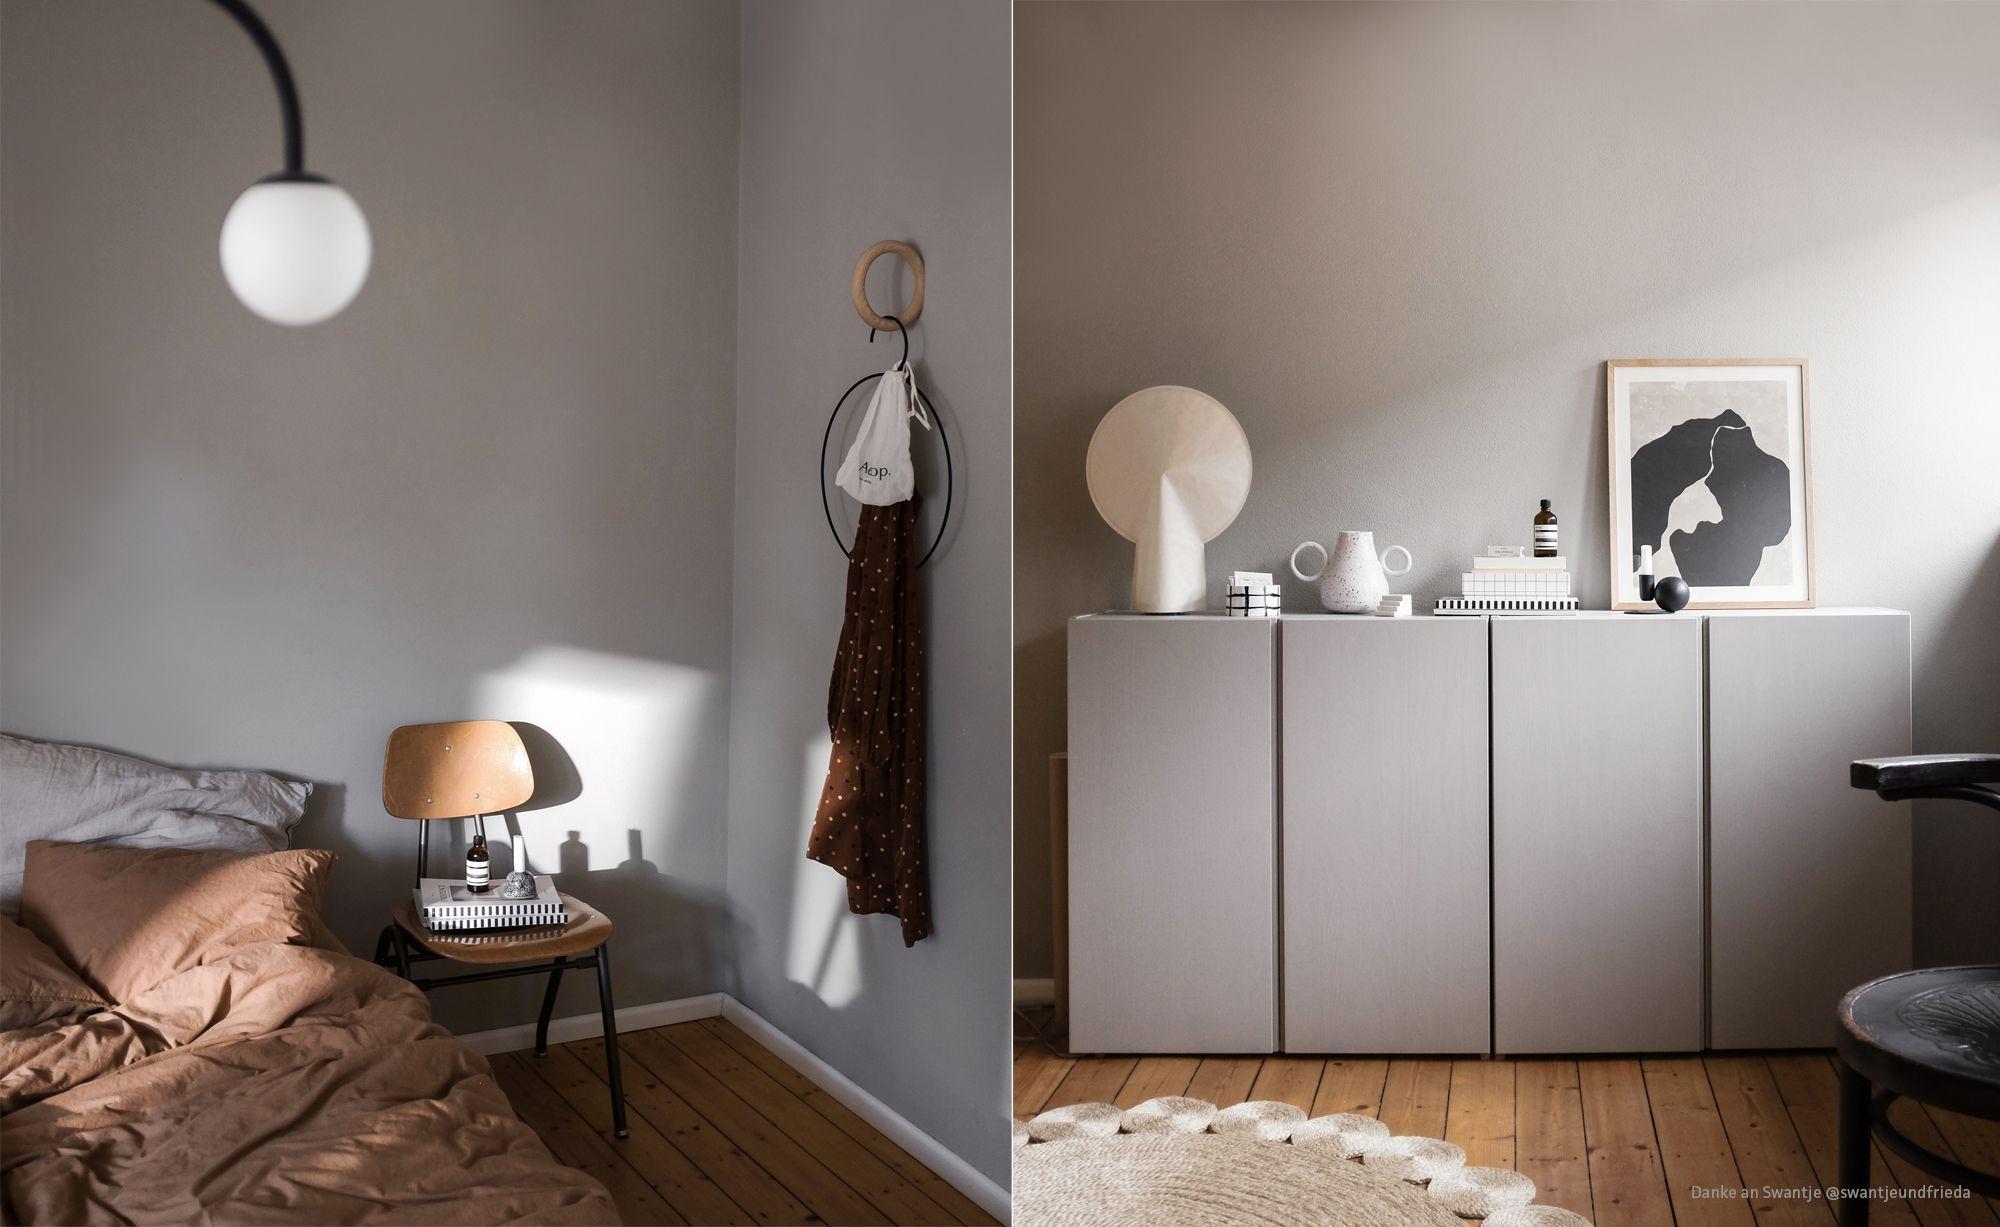 Wandfarben In Taupe Von Kolorat I Farben Online Bestellen Wandfarbe Taupe Wandfarbe Wandfarbe Grau